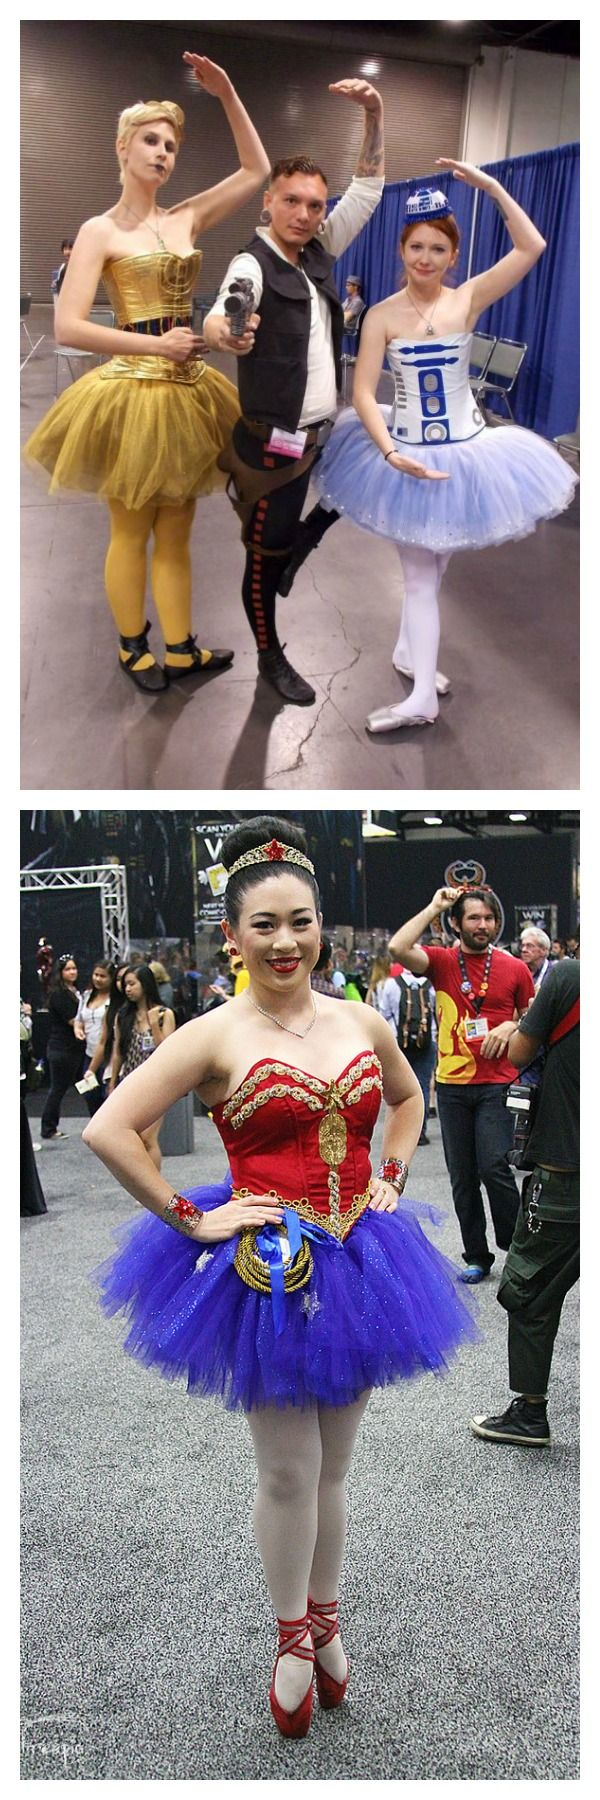 Mixed Costume Themes: Ballerina R2D2, C3PO, Jack Sparrow & Wonder Woman